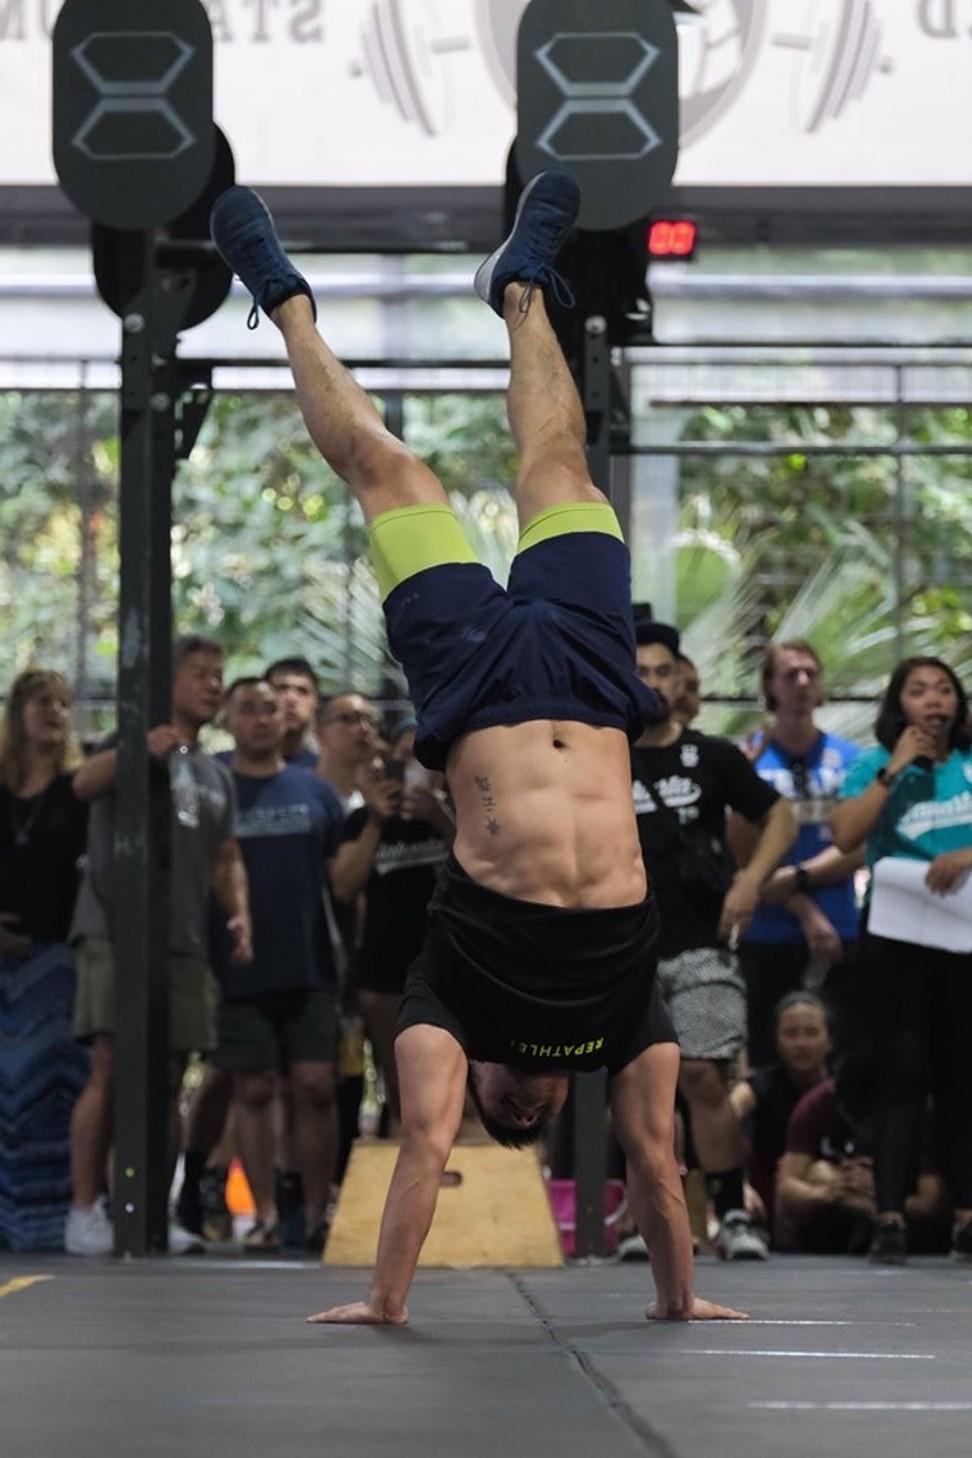 Ooi said balancing CrossFit with a job can require sacrifice at times. Photo: Hairol Mokti